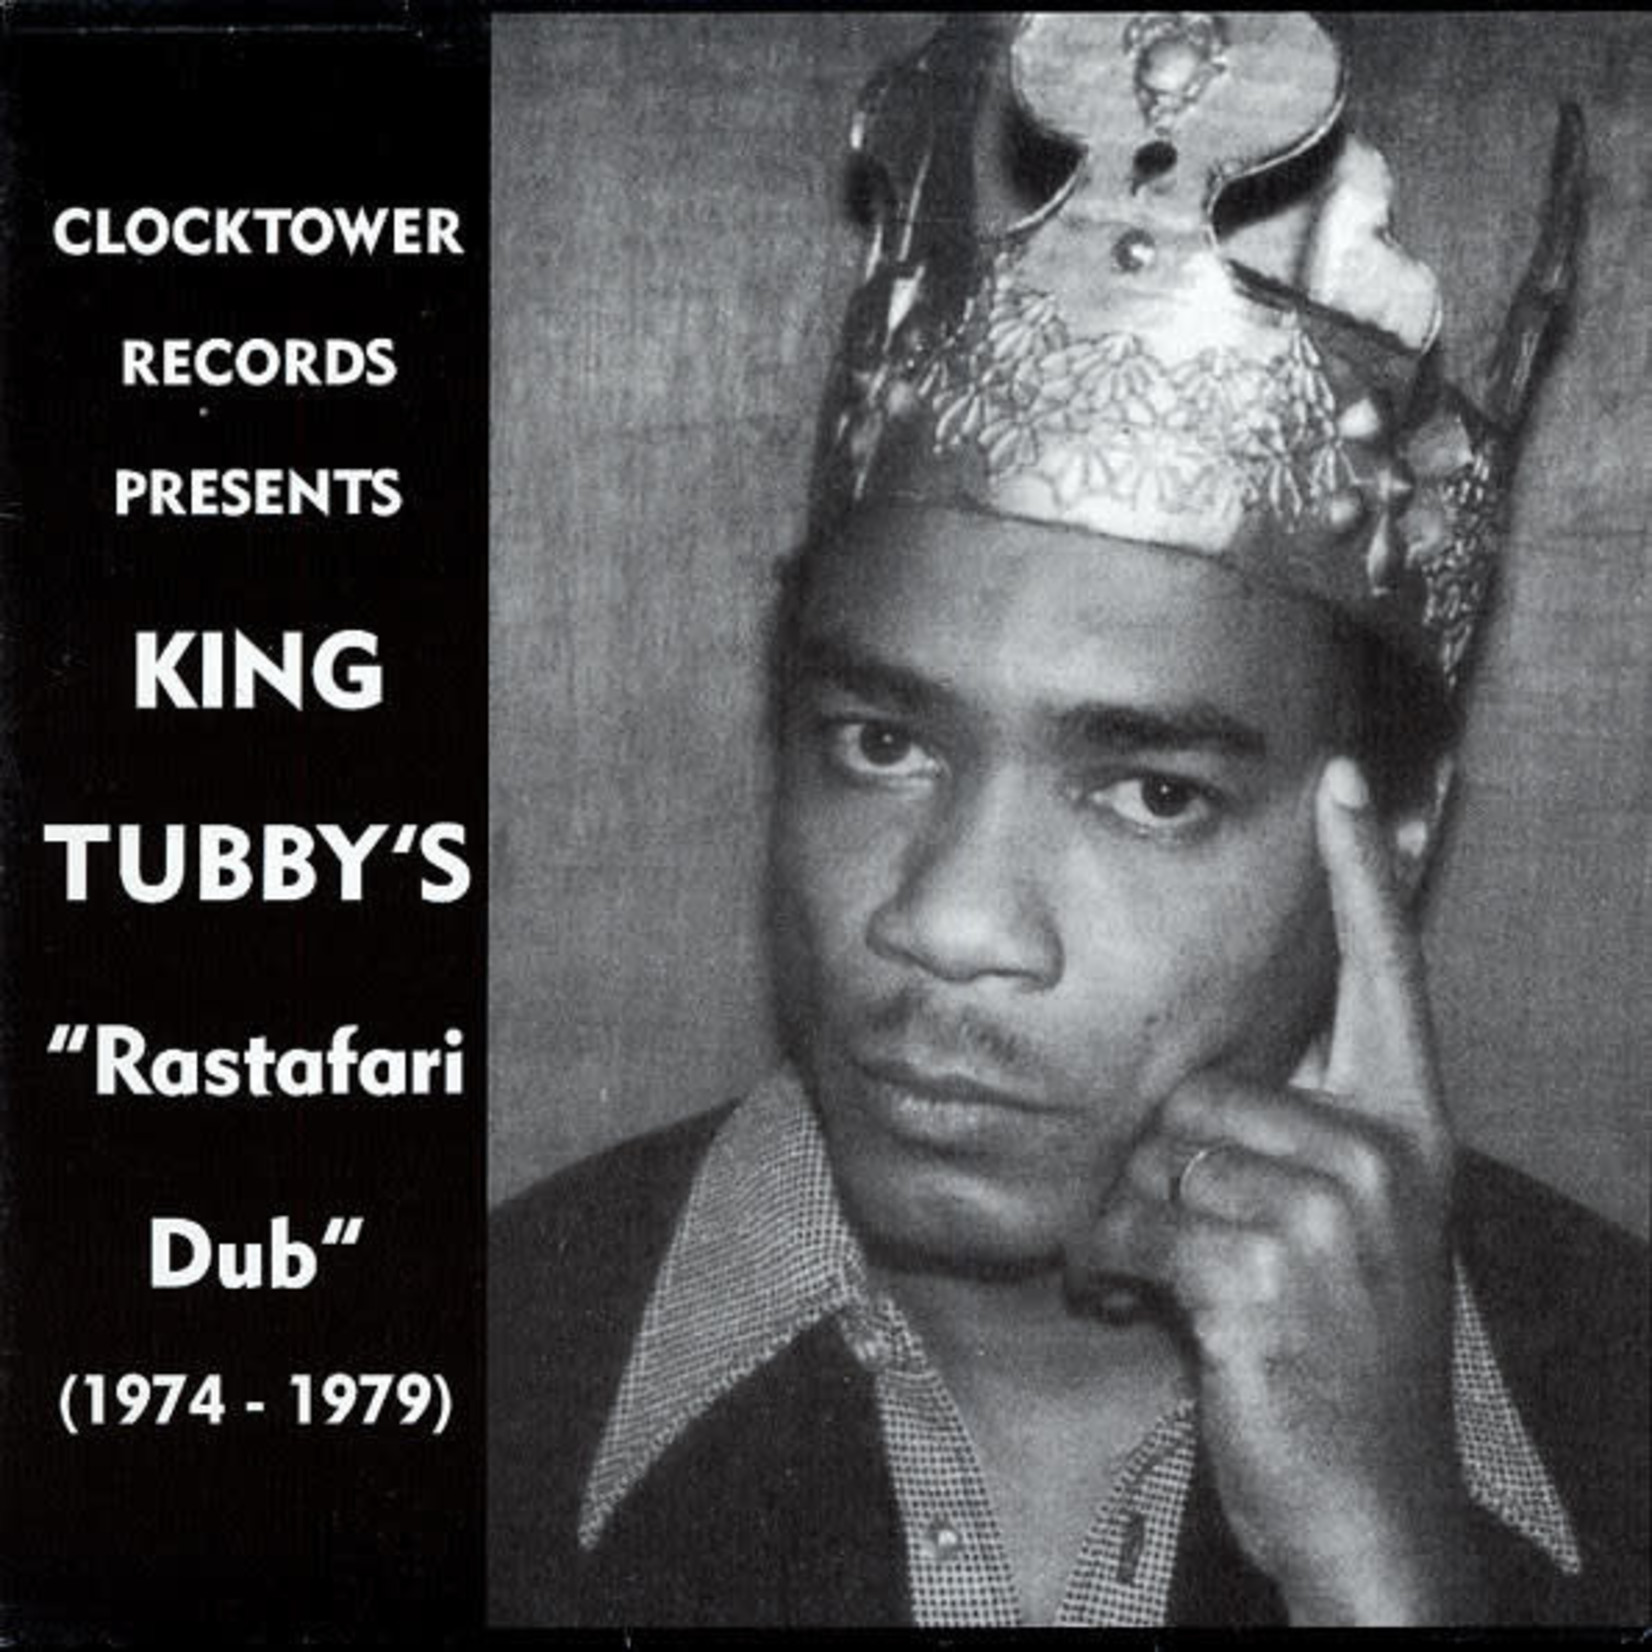 [New] King Tubby: Crazy Bald Head Dub